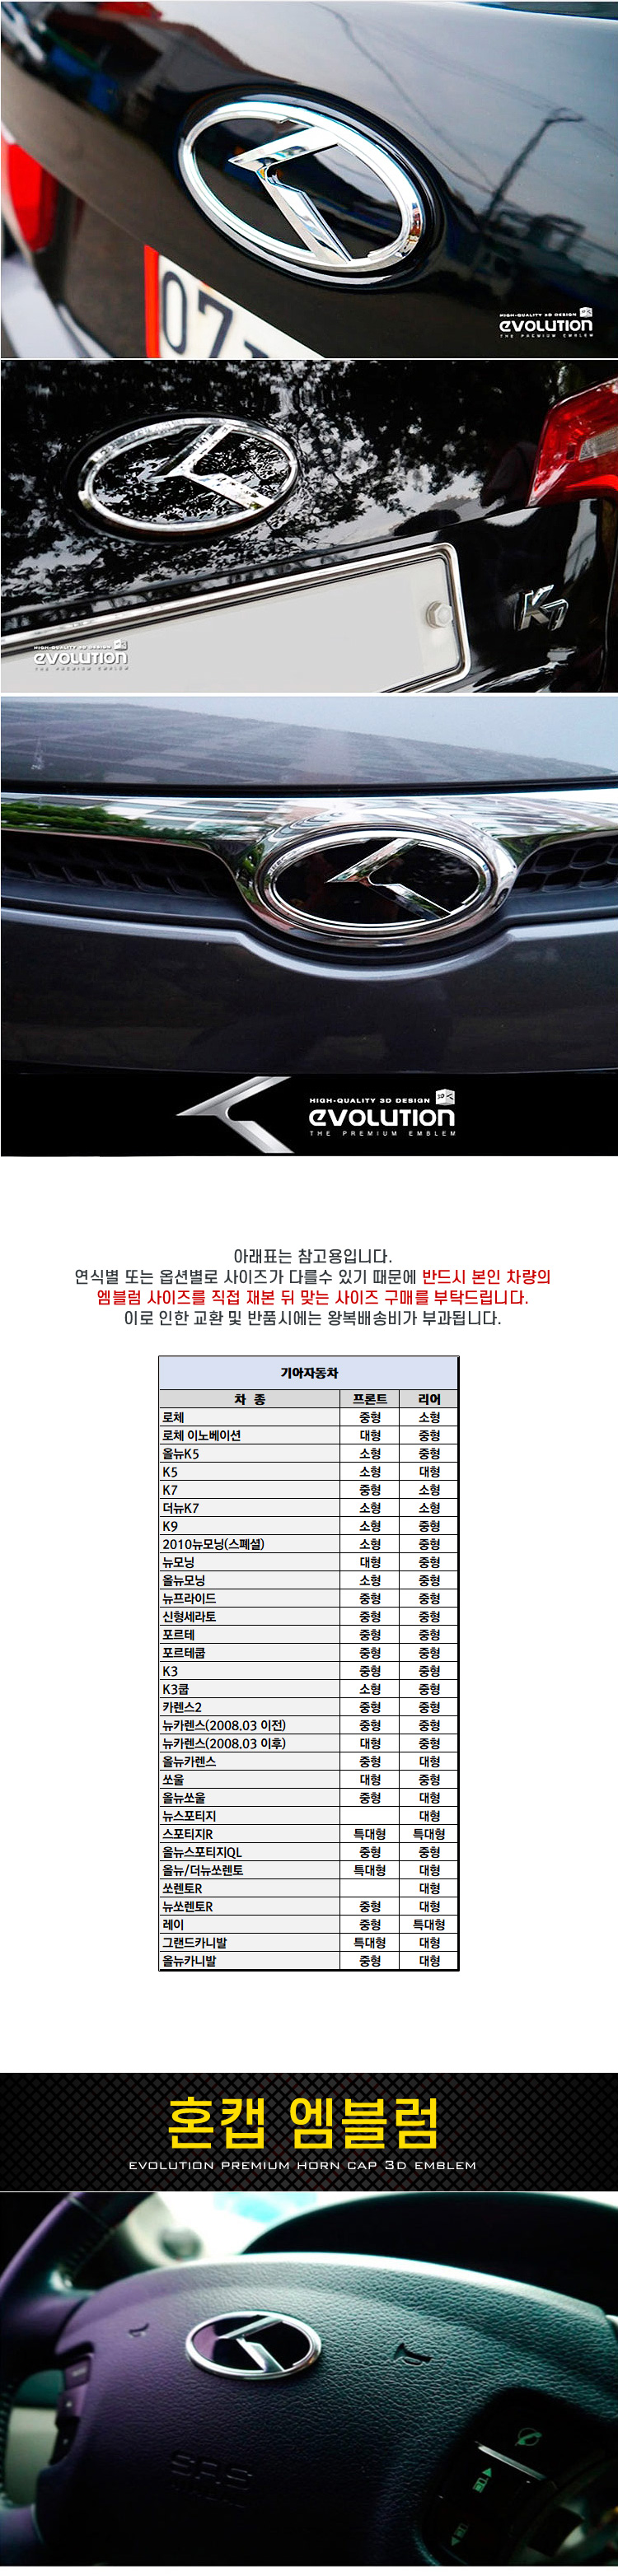 evolution-3d-emblem_04.jpg